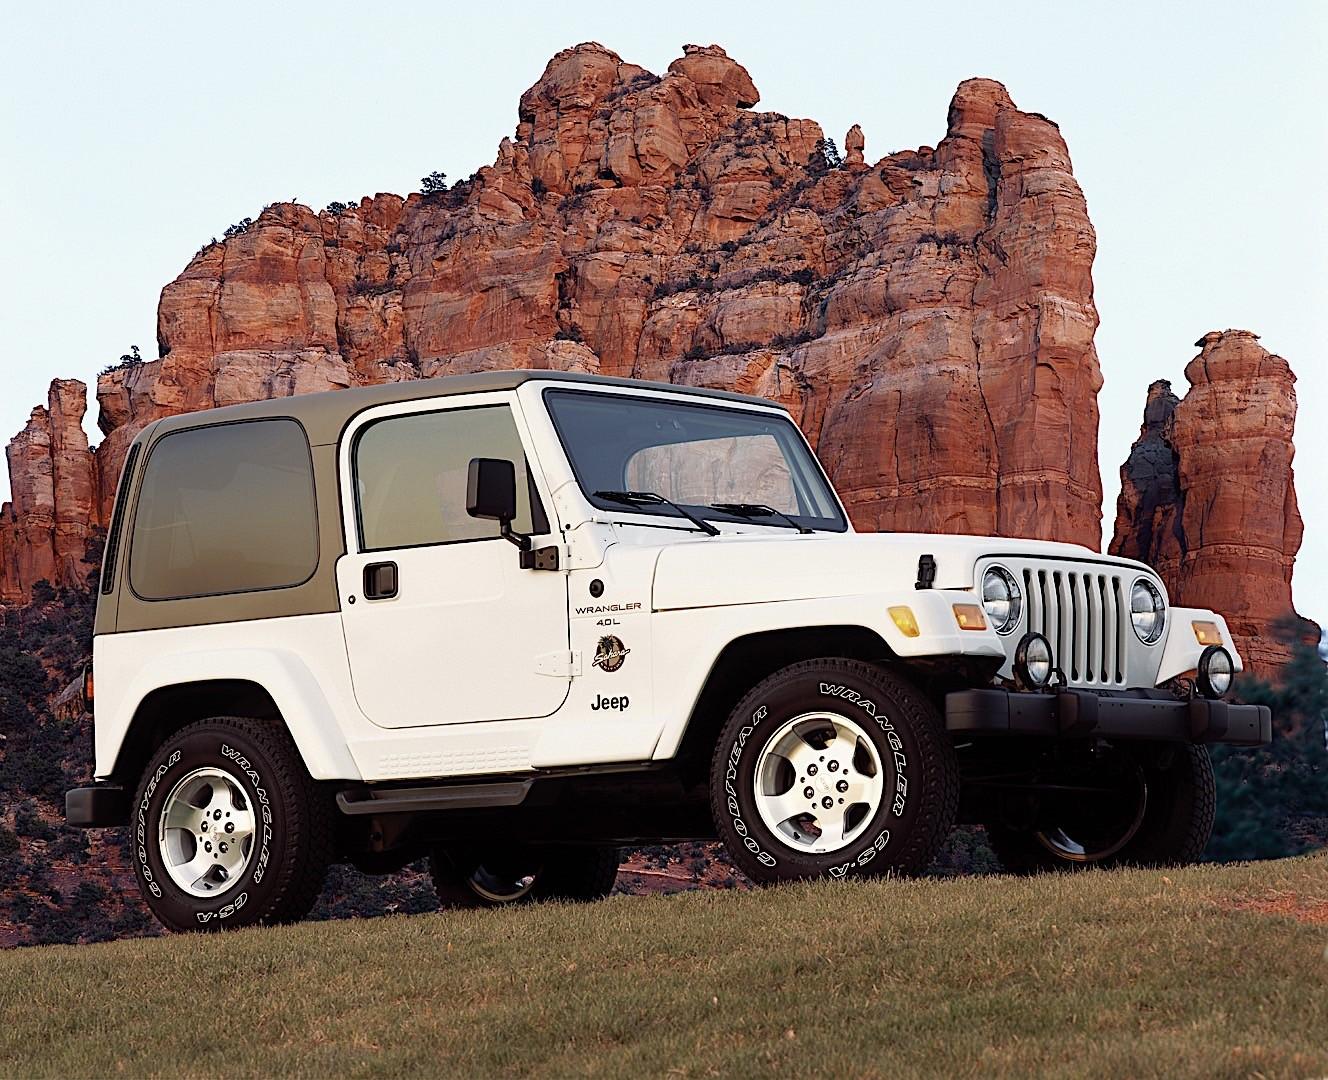 Jeep Wrangler on 1998 Jeep Wrangler Tj